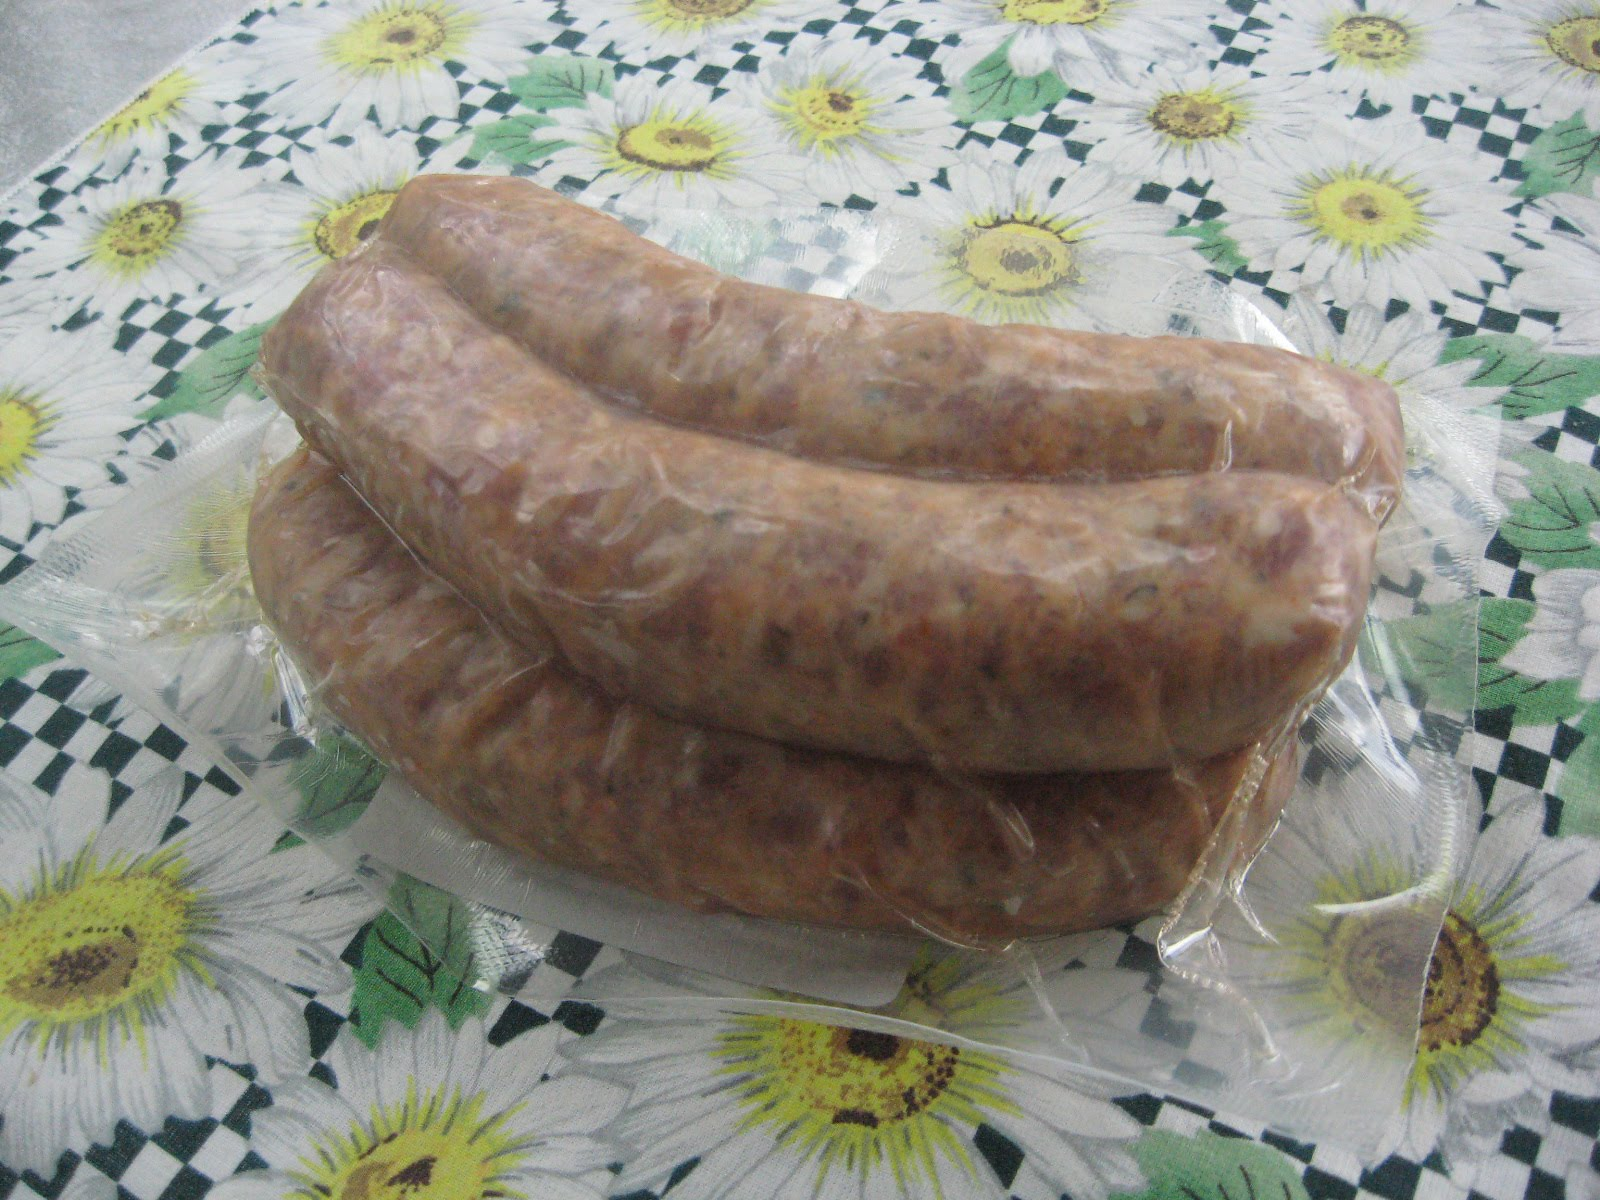 Man Cave Mini Brats : Barbecue master man cave tomato basil brat review